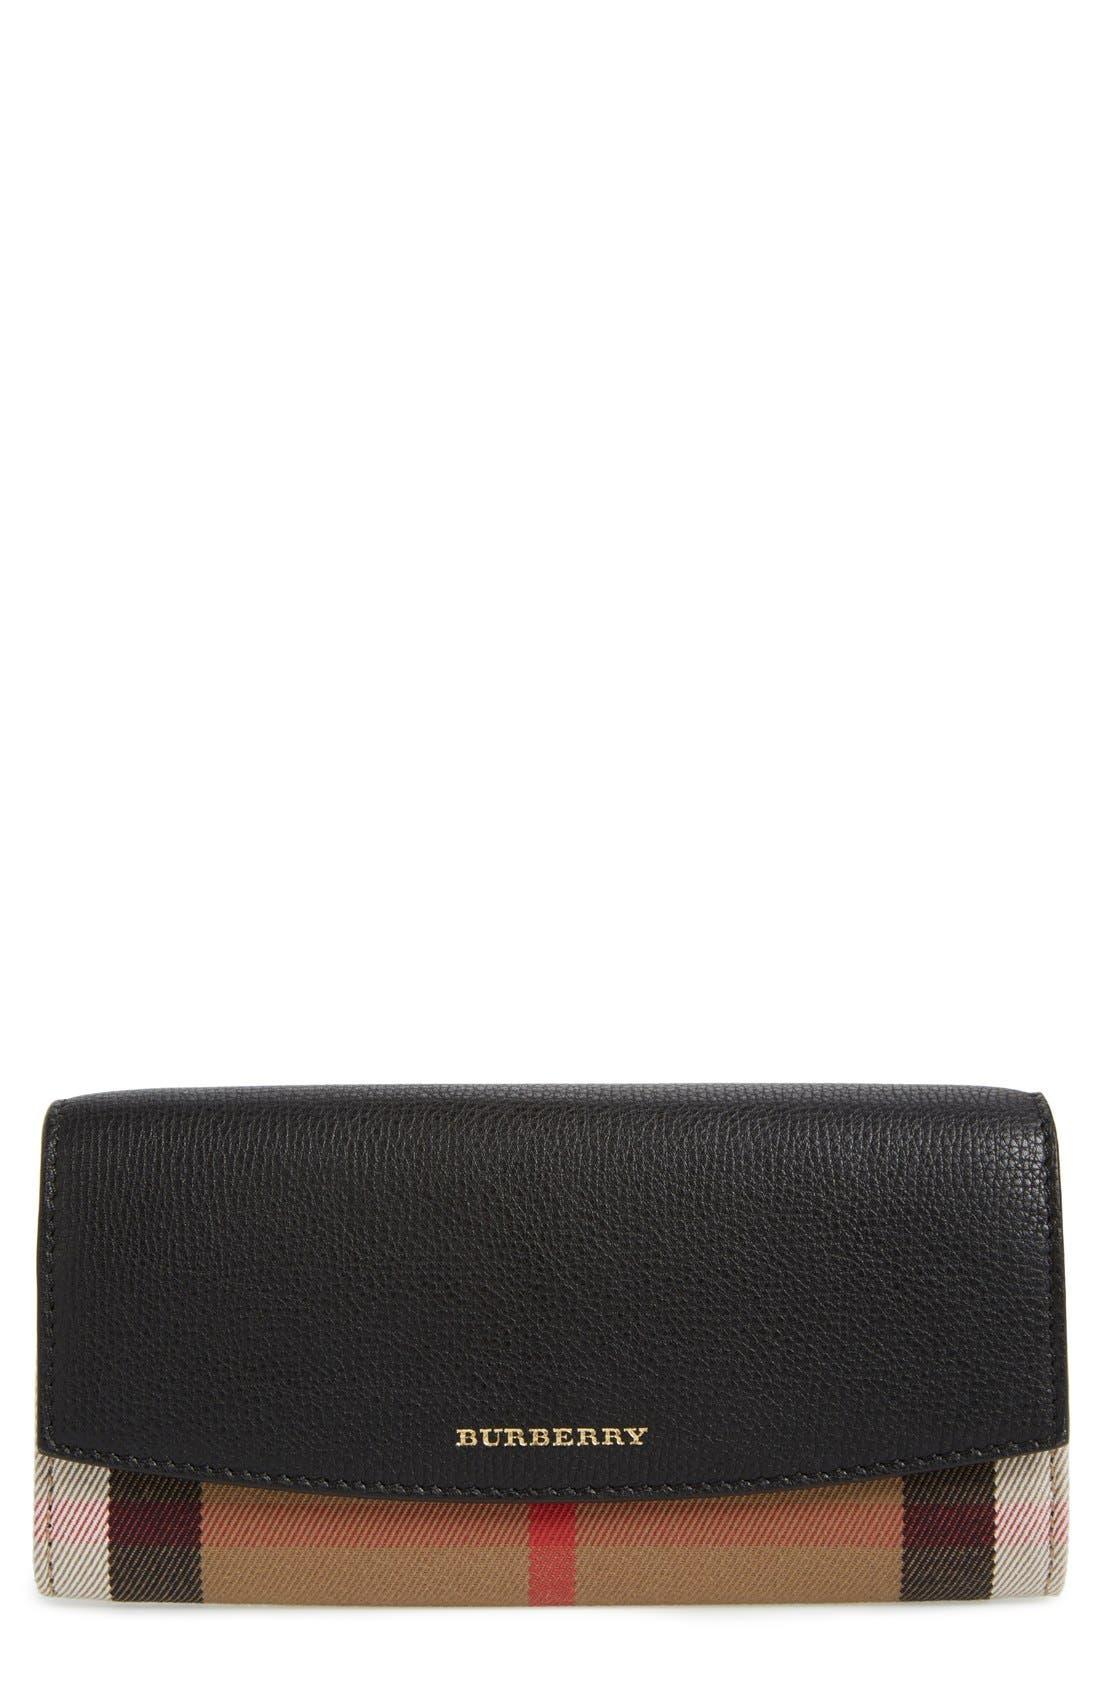 'Porter' Continental Wallet,                             Main thumbnail 1, color,                             BLACK GLD HRDWRE